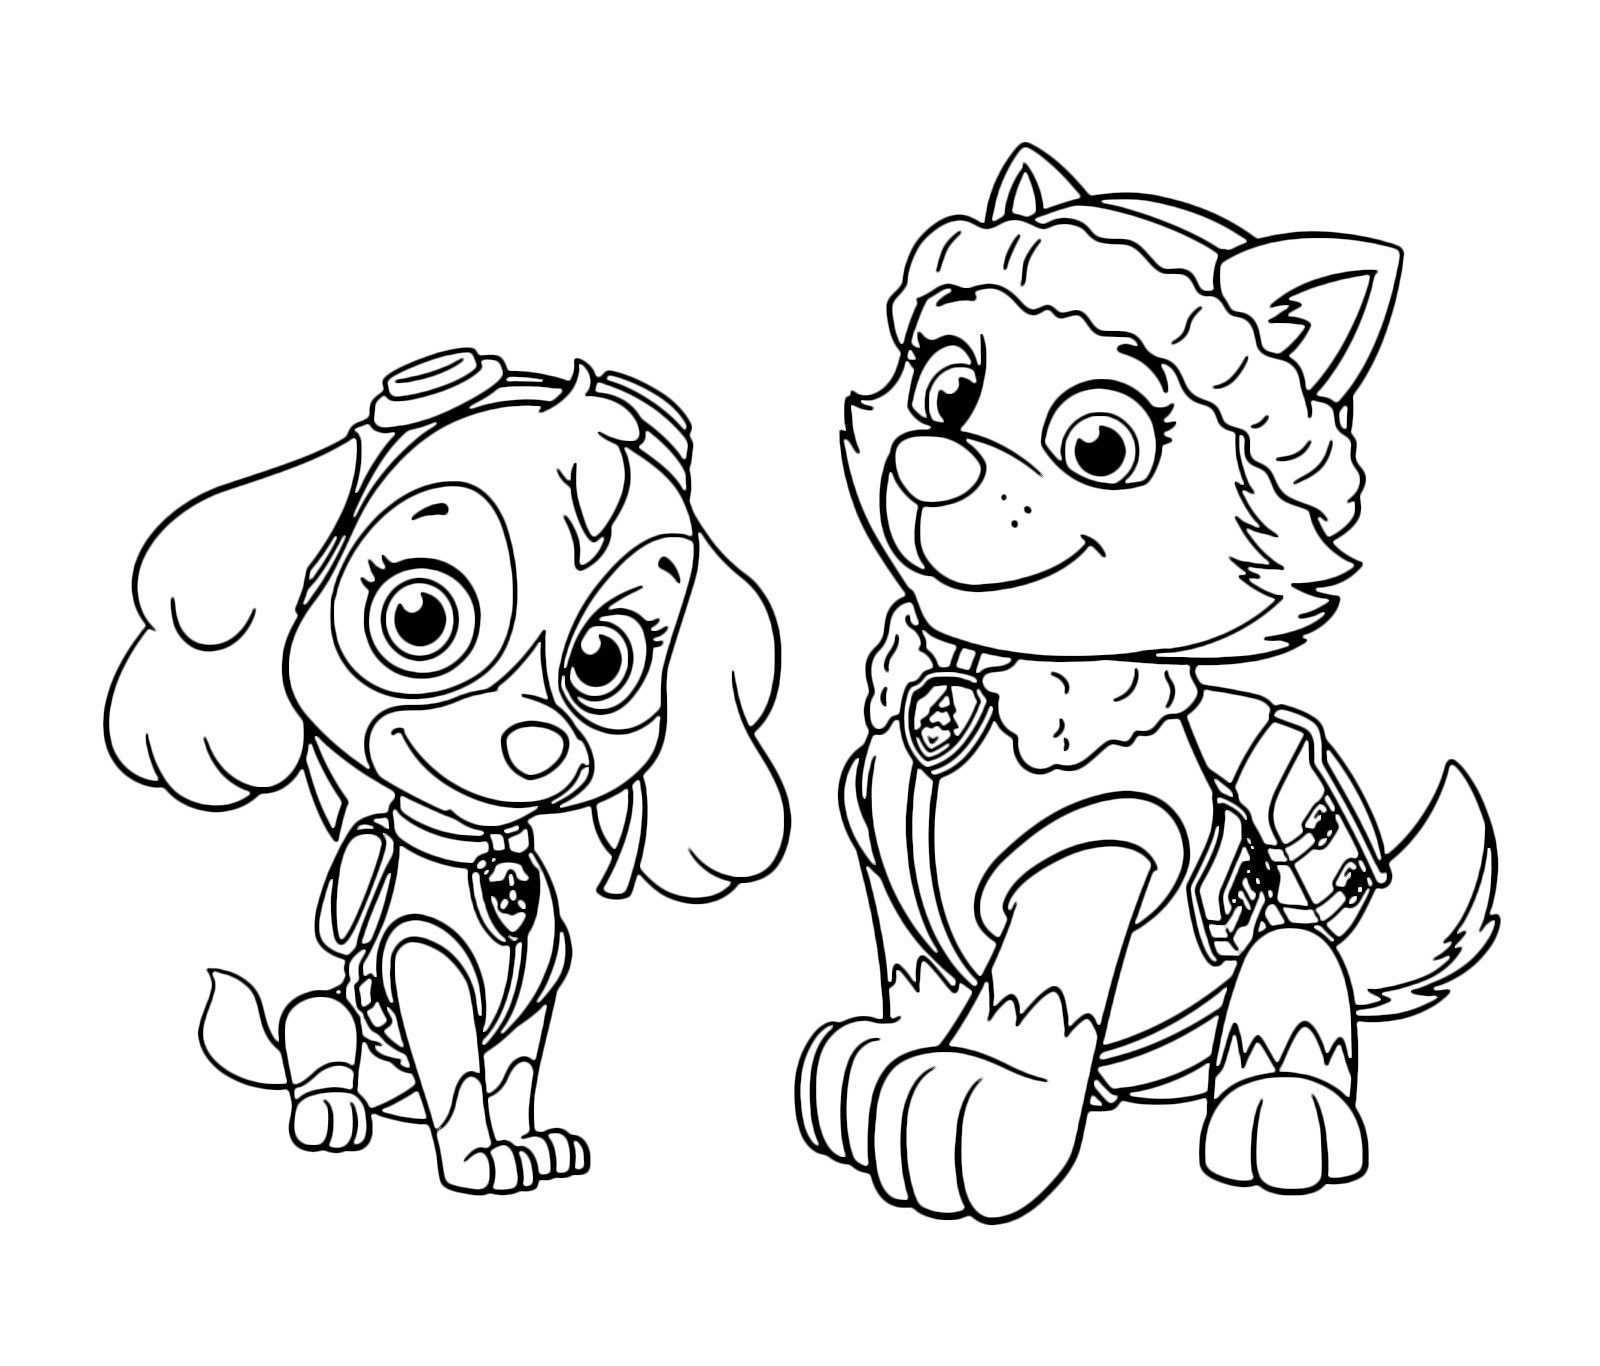 kleurplaat paw patrol mighty pups zuma